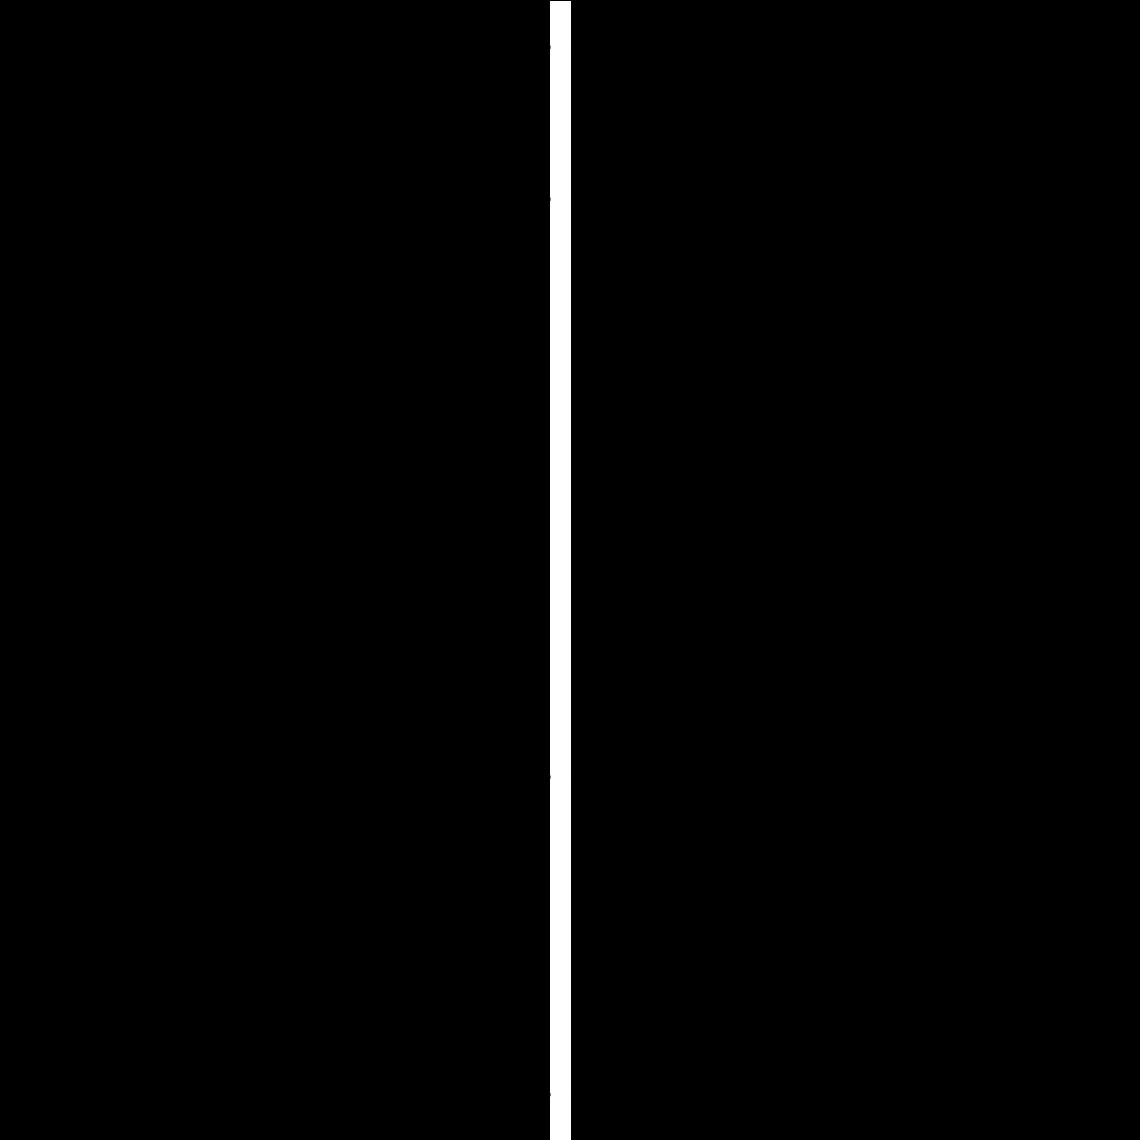 29LT-Zarid-Text-Image-20